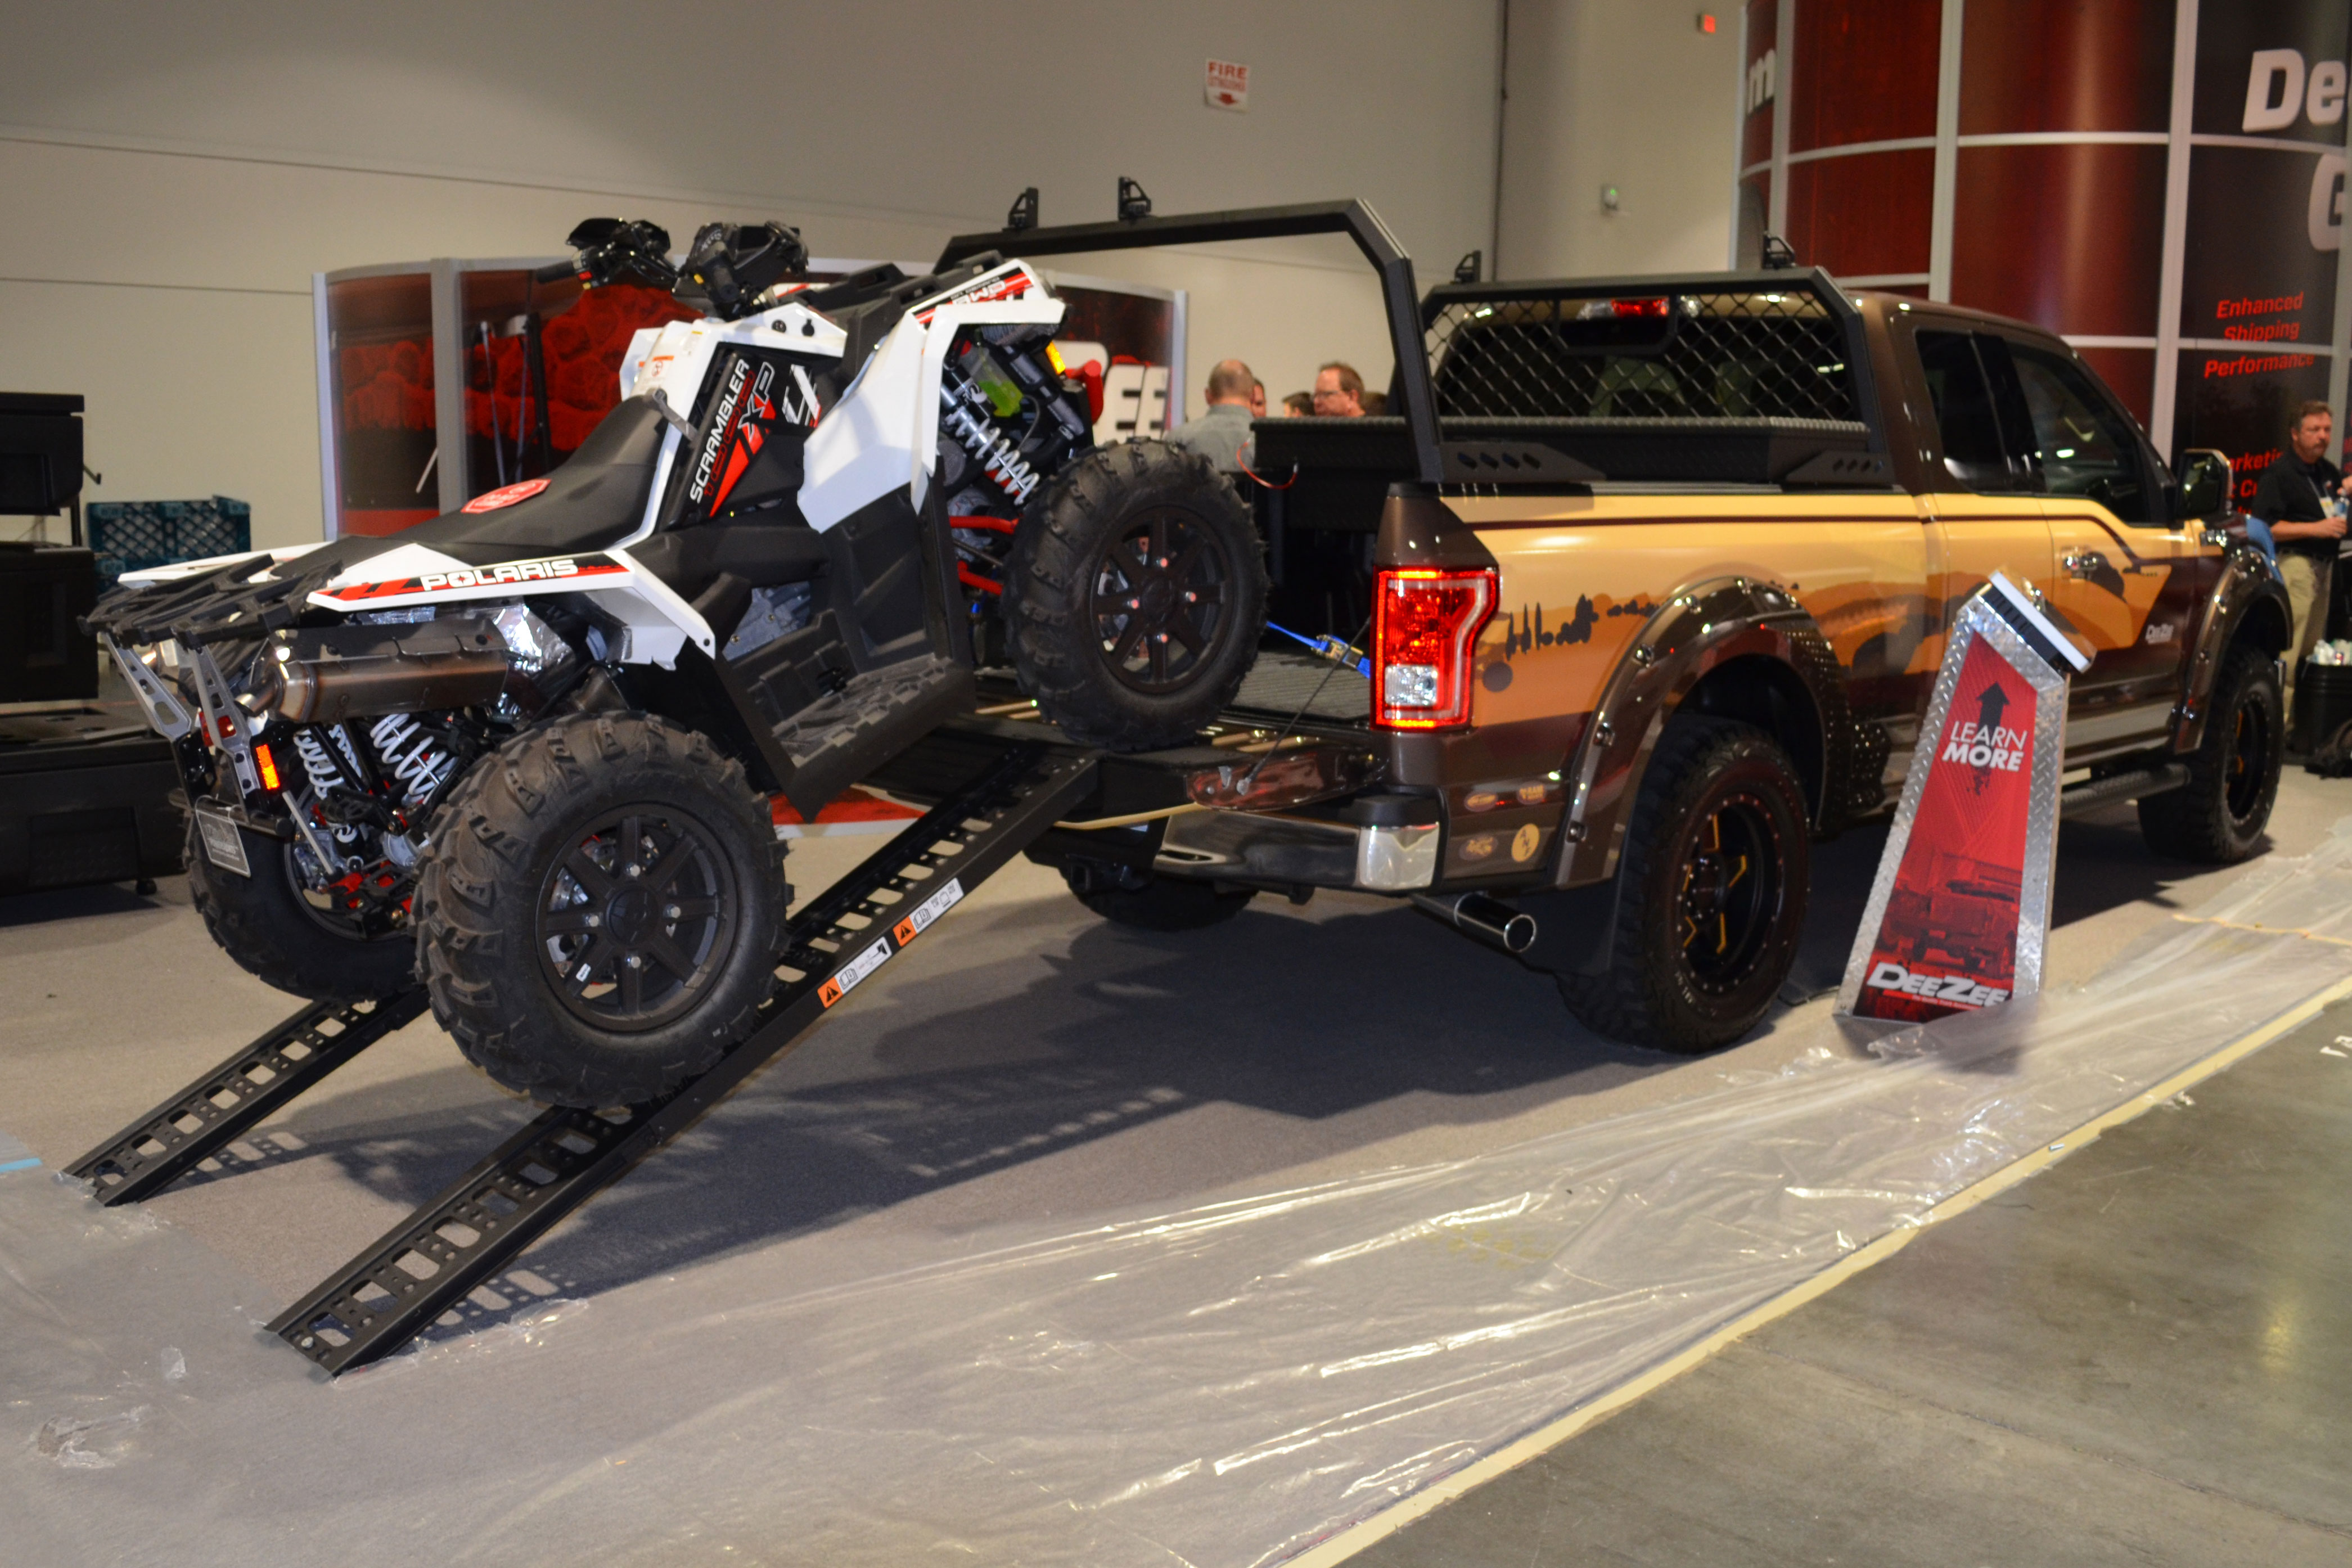 2015 SEMA Show Monday loading truck